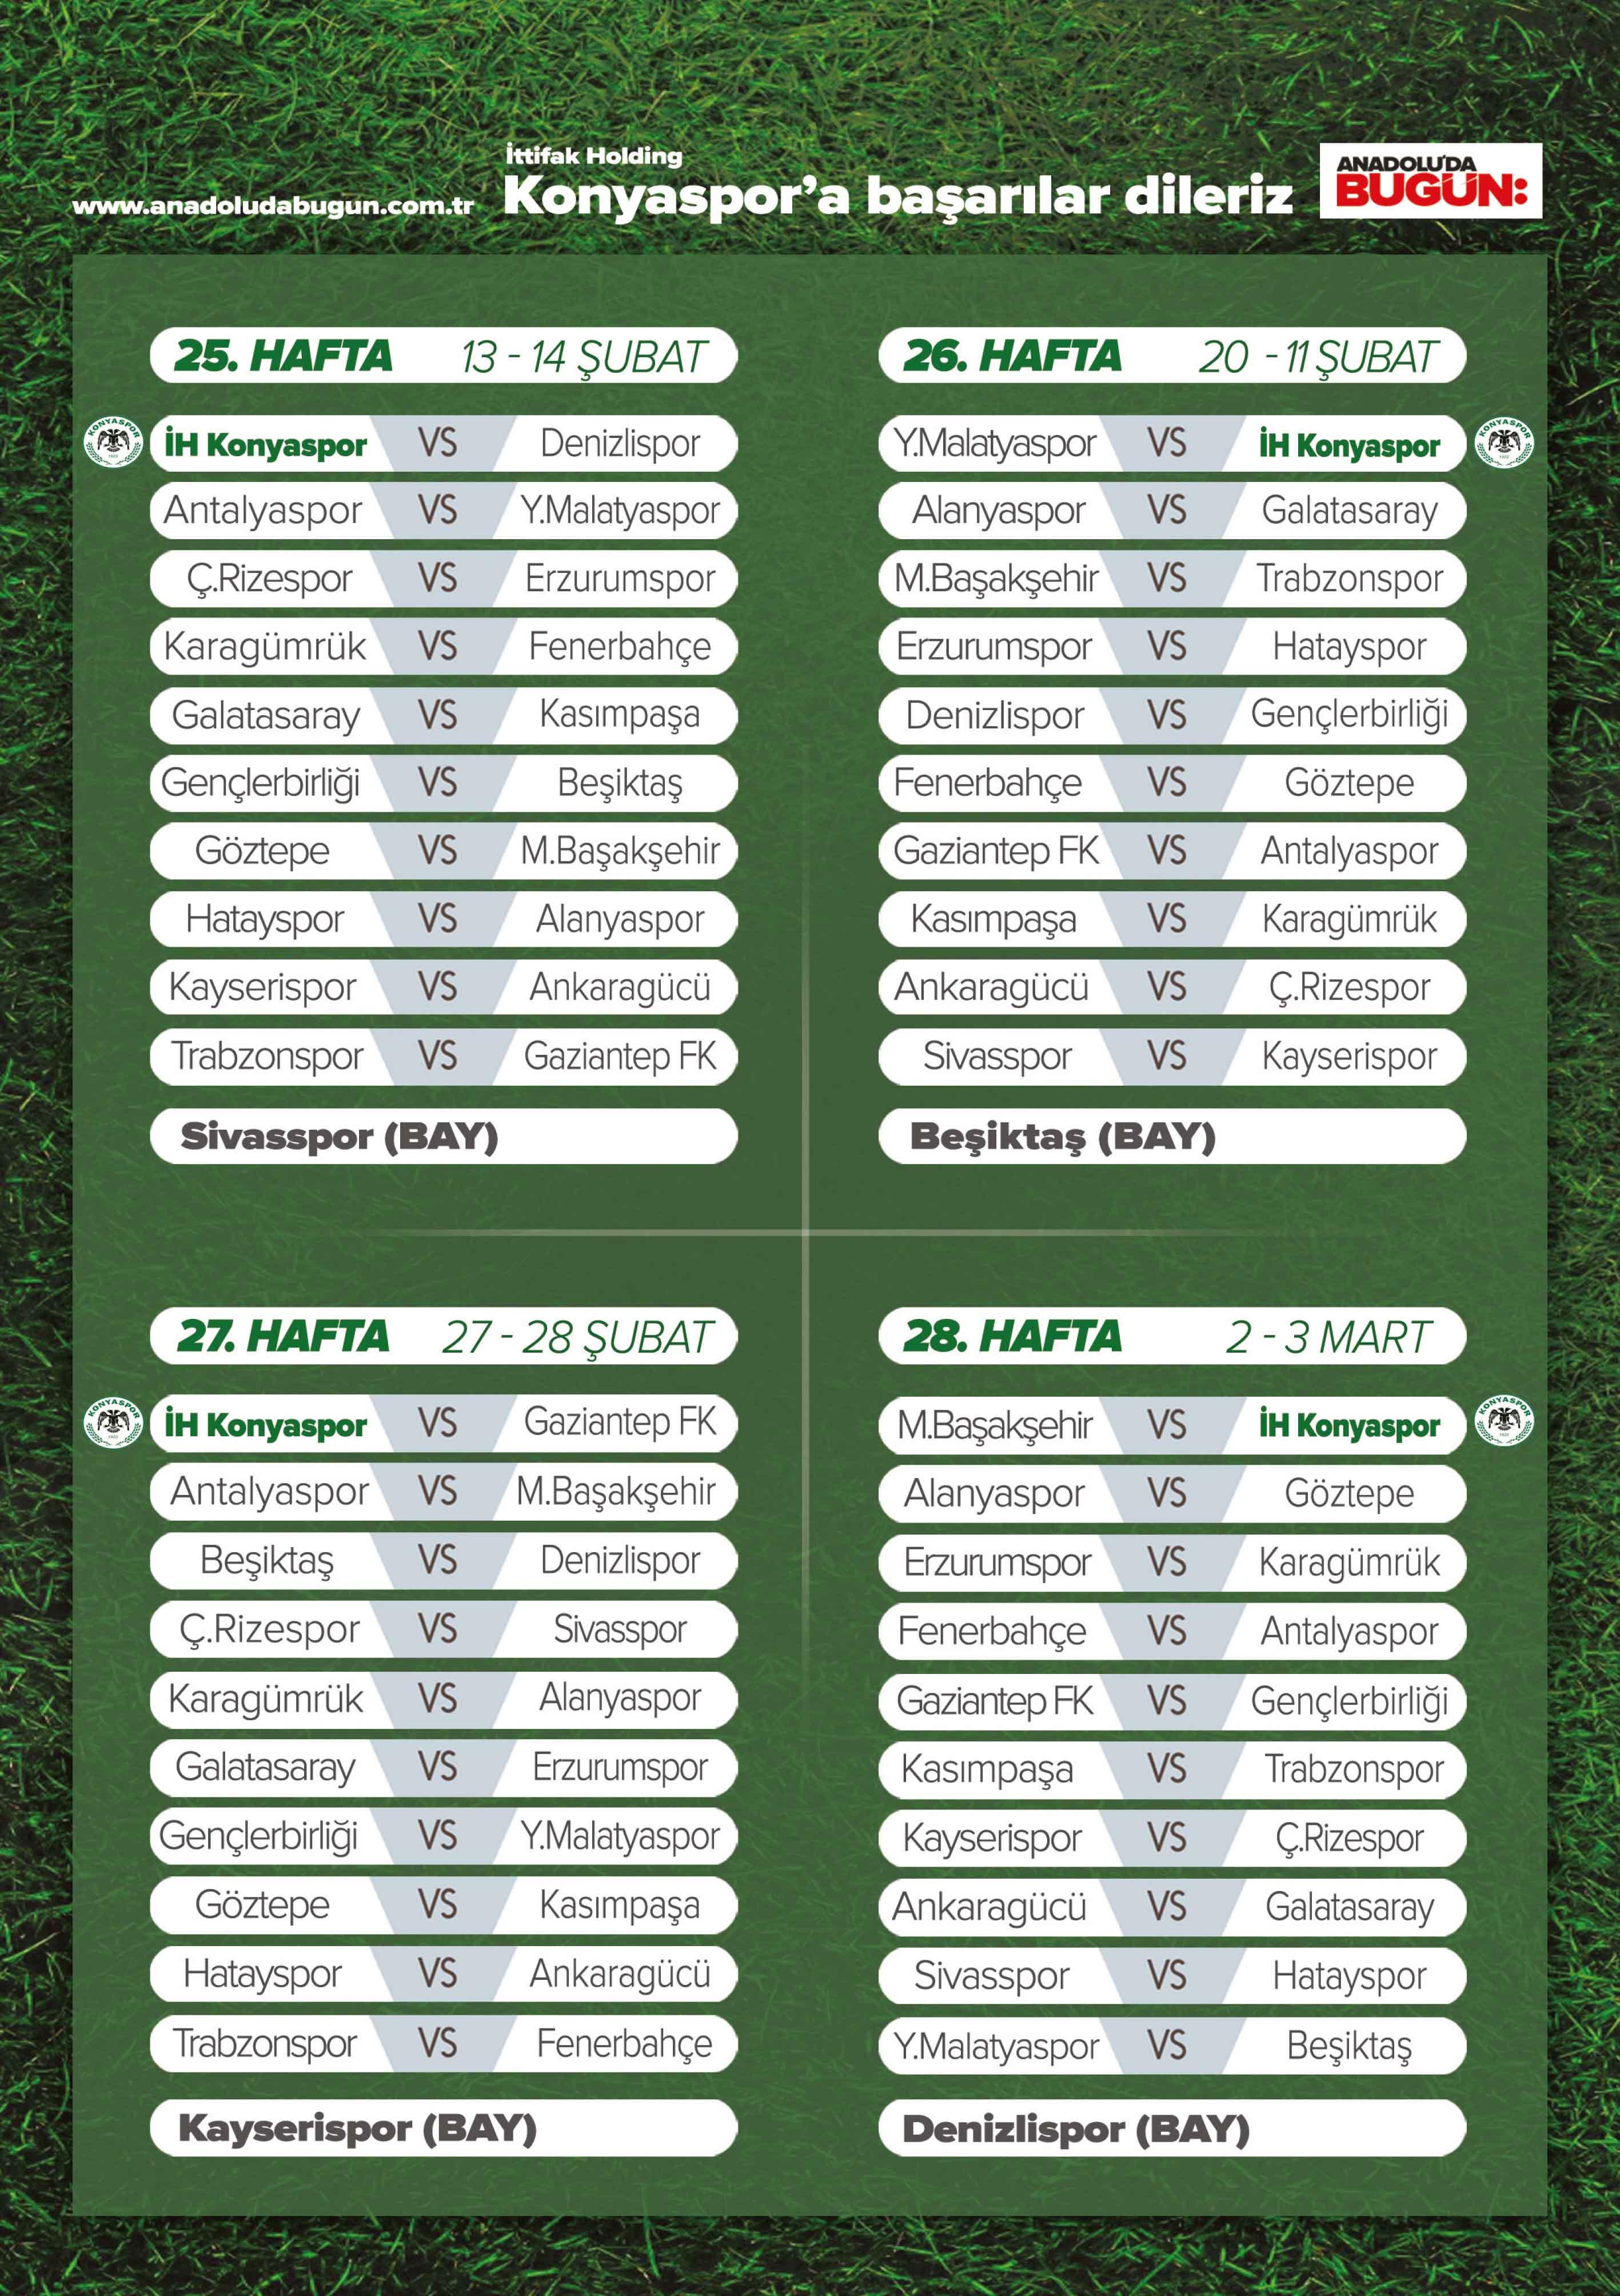 ih-konyaspor-2020-2021-fiksturu-020.jpg